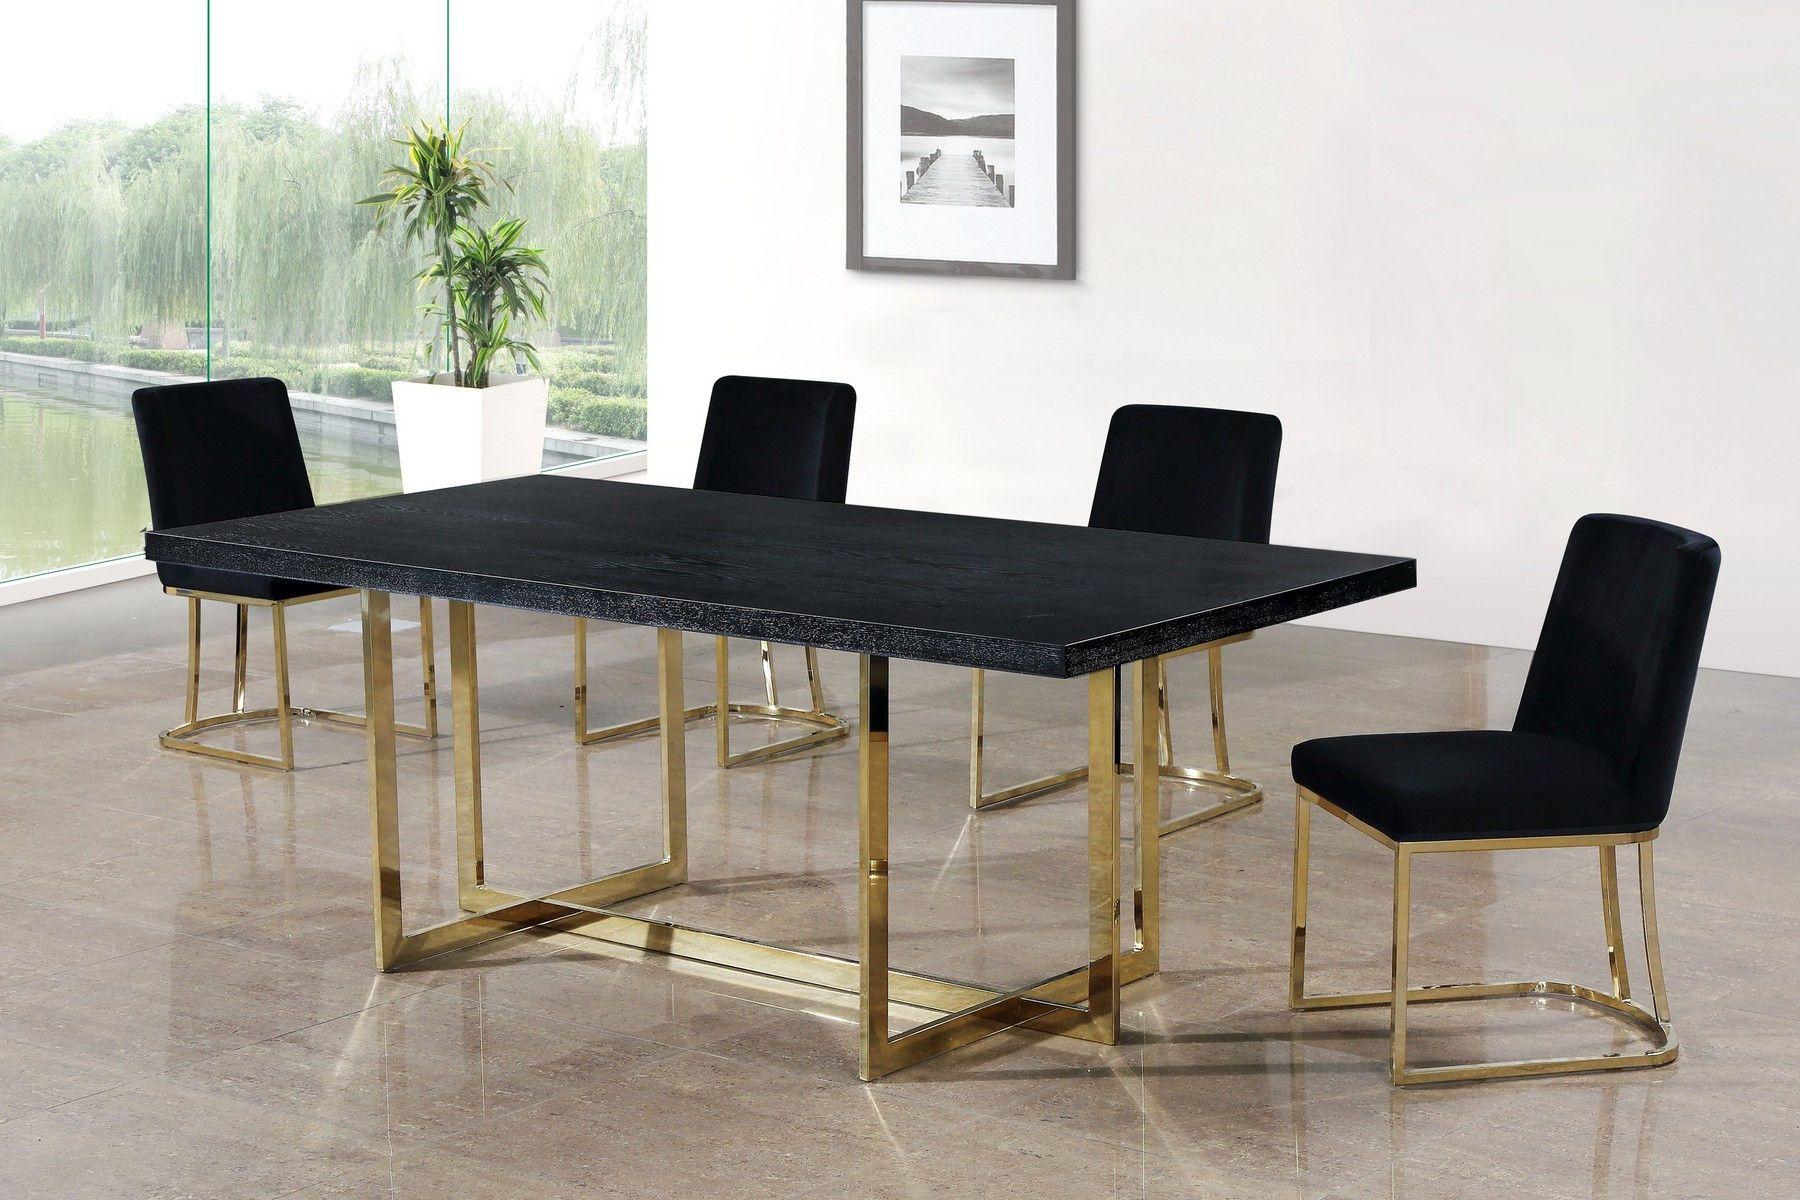 Heidi Black Dining Chair 776 Meridian Furniture Dining Chairs In 2021 Gold Dining Room Dining Table Gold Dining Chairs Diy